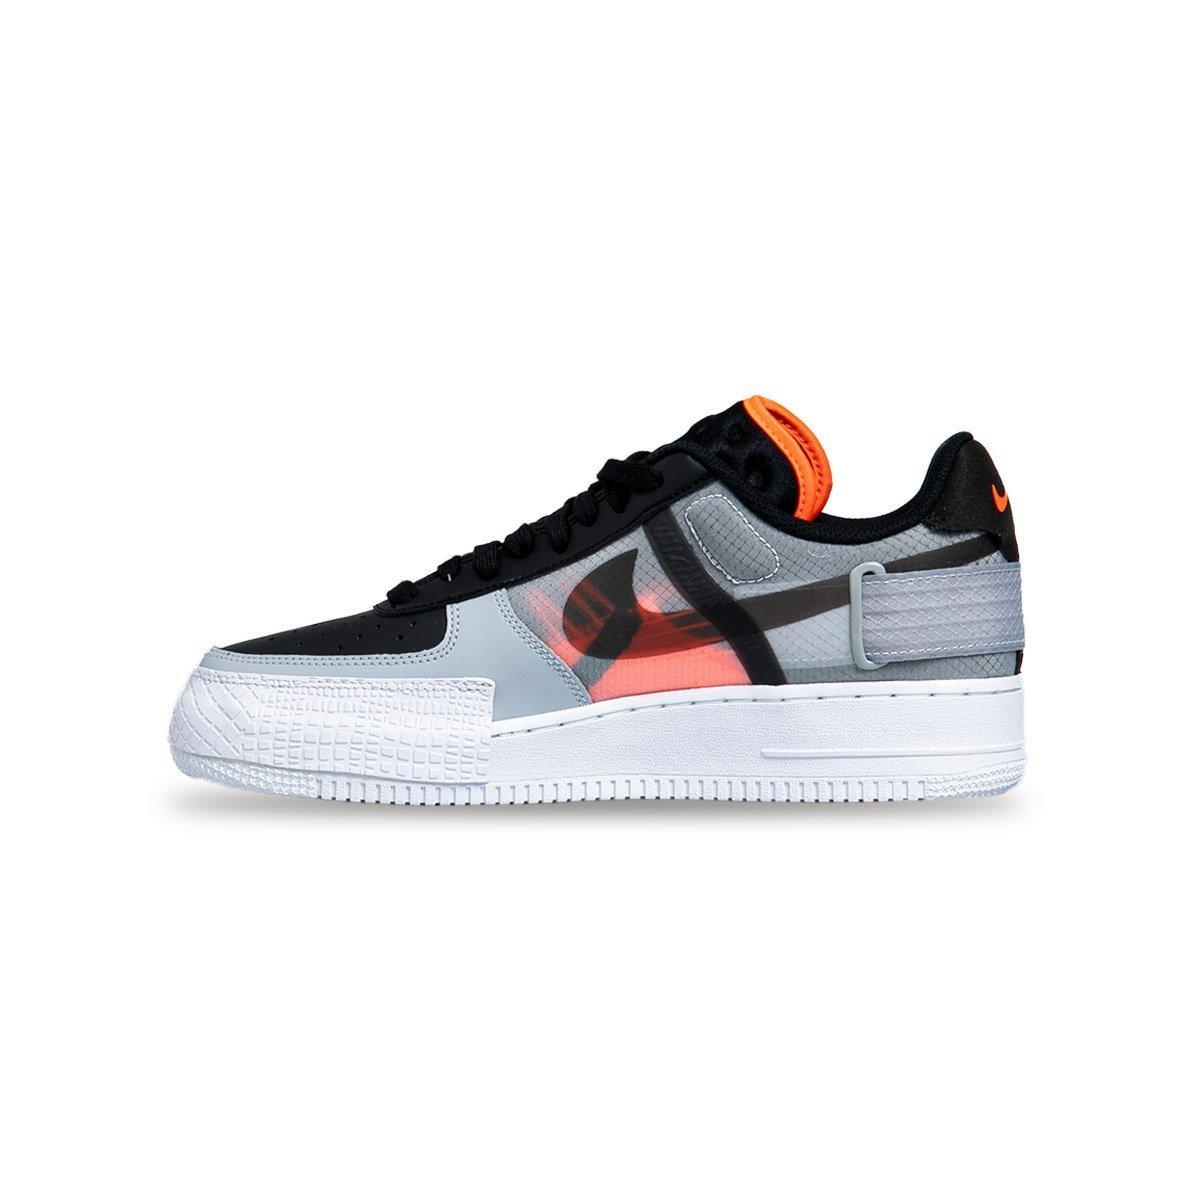 Sneakers buty Nike Air Force 1 Type czarne (CQ2344 001)